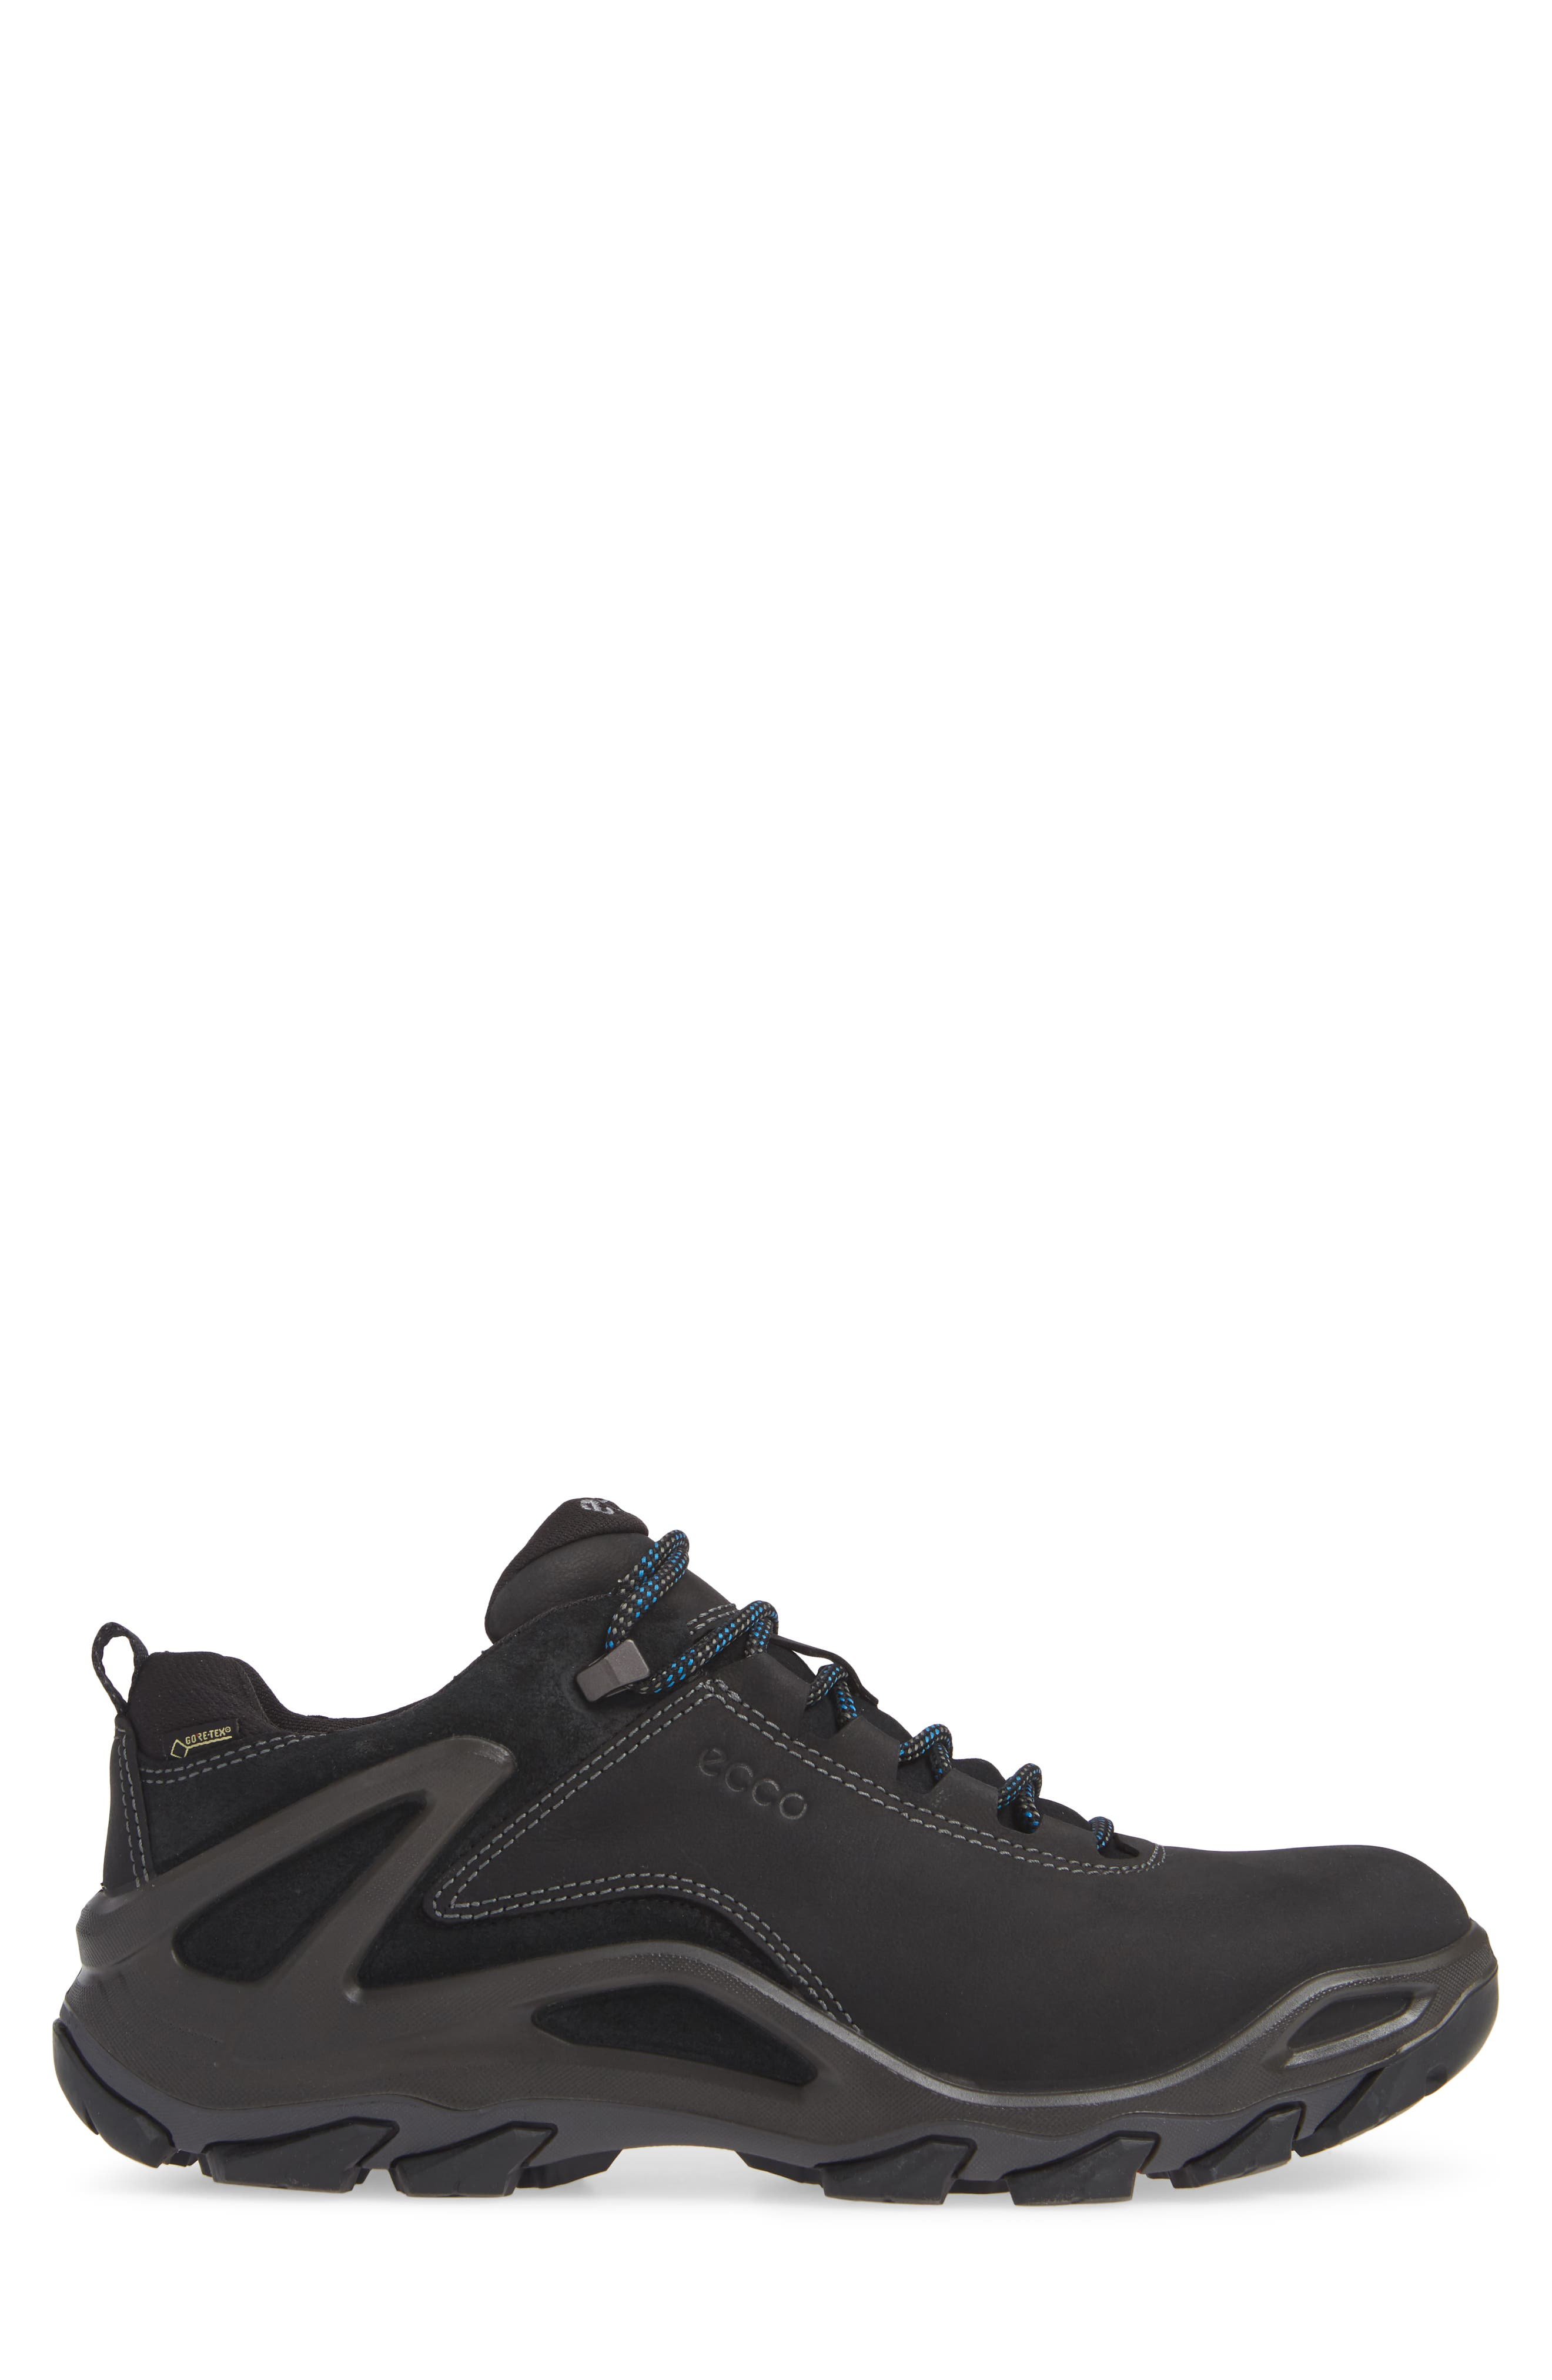 Terra Evo GTX Low Hiking Shoe,                             Alternate thumbnail 3, color,                             009